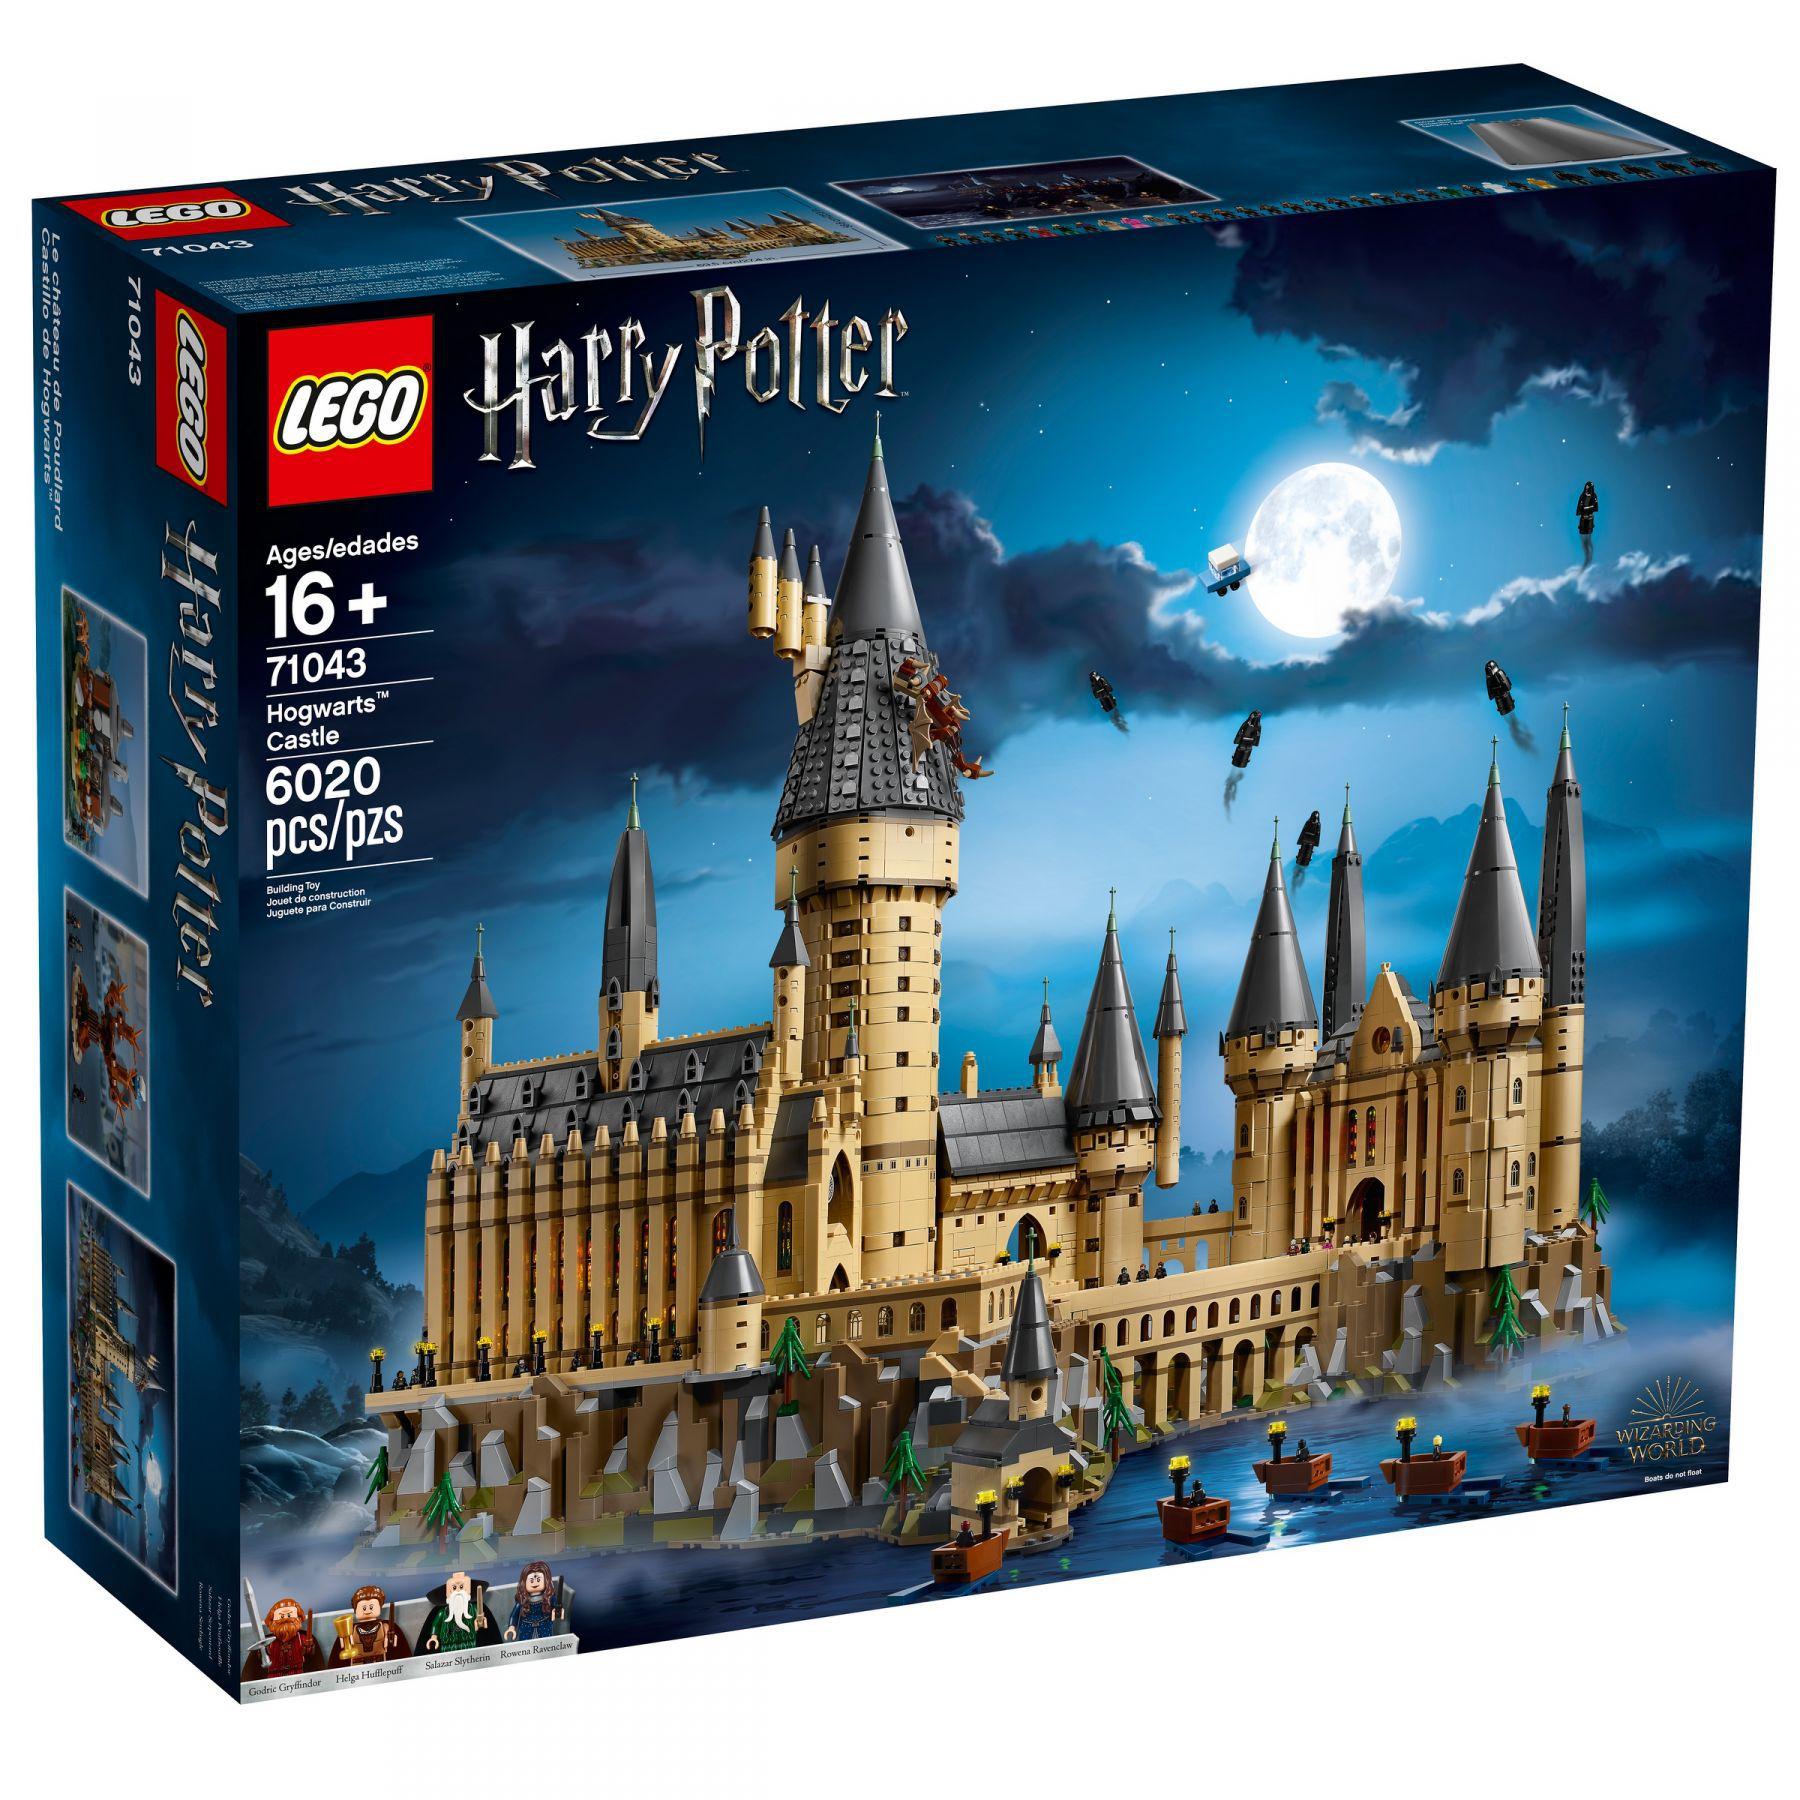 LEGO_71043_Hogwarts-Castle-1.jpg